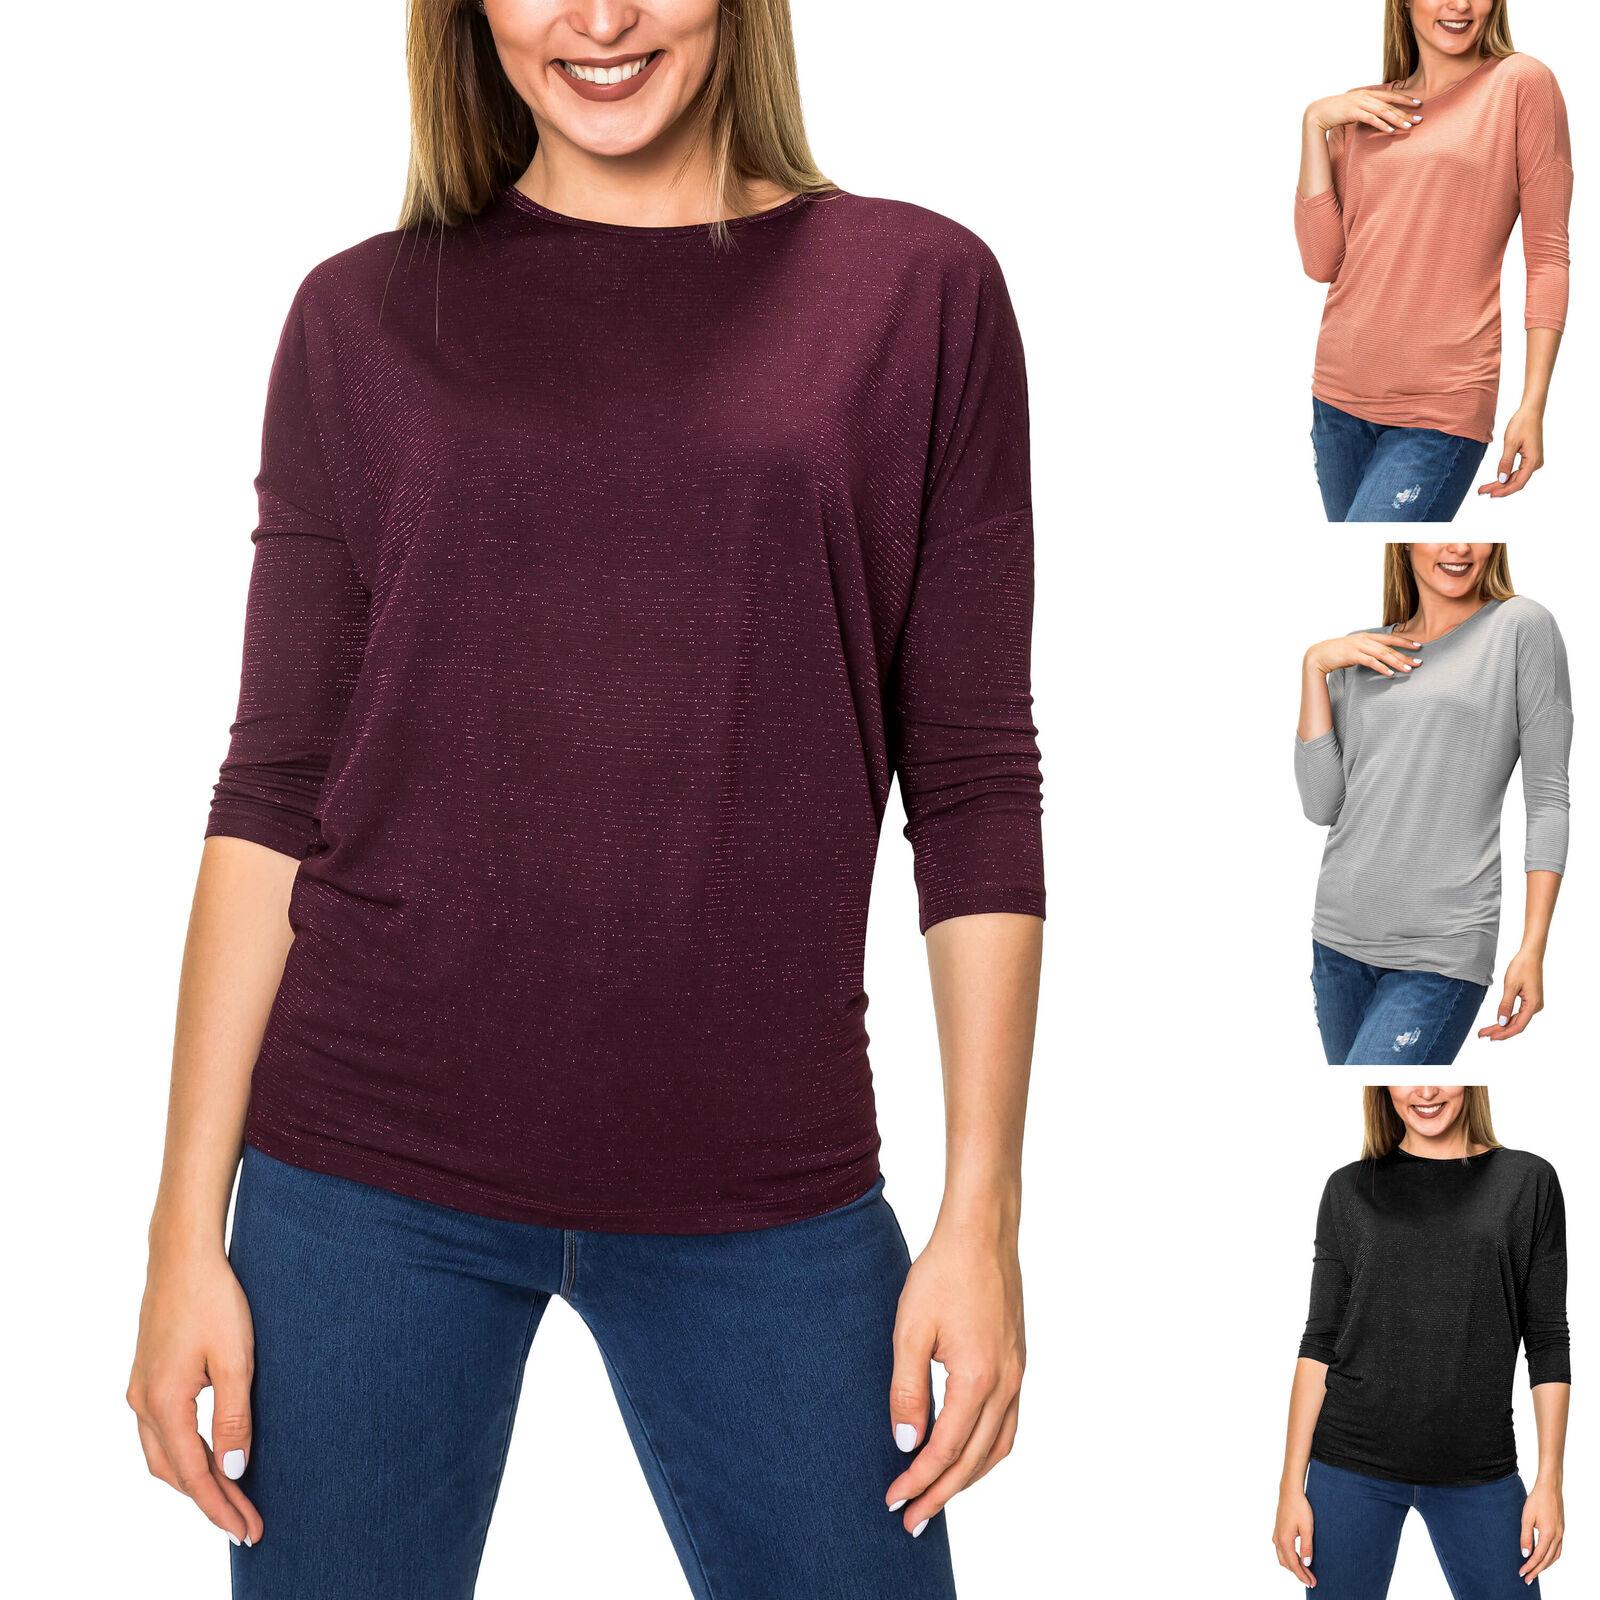 Pieces Damen Langarmshirt Shirt O-Neck mit Lockerem Passform Gestreift Glitzer